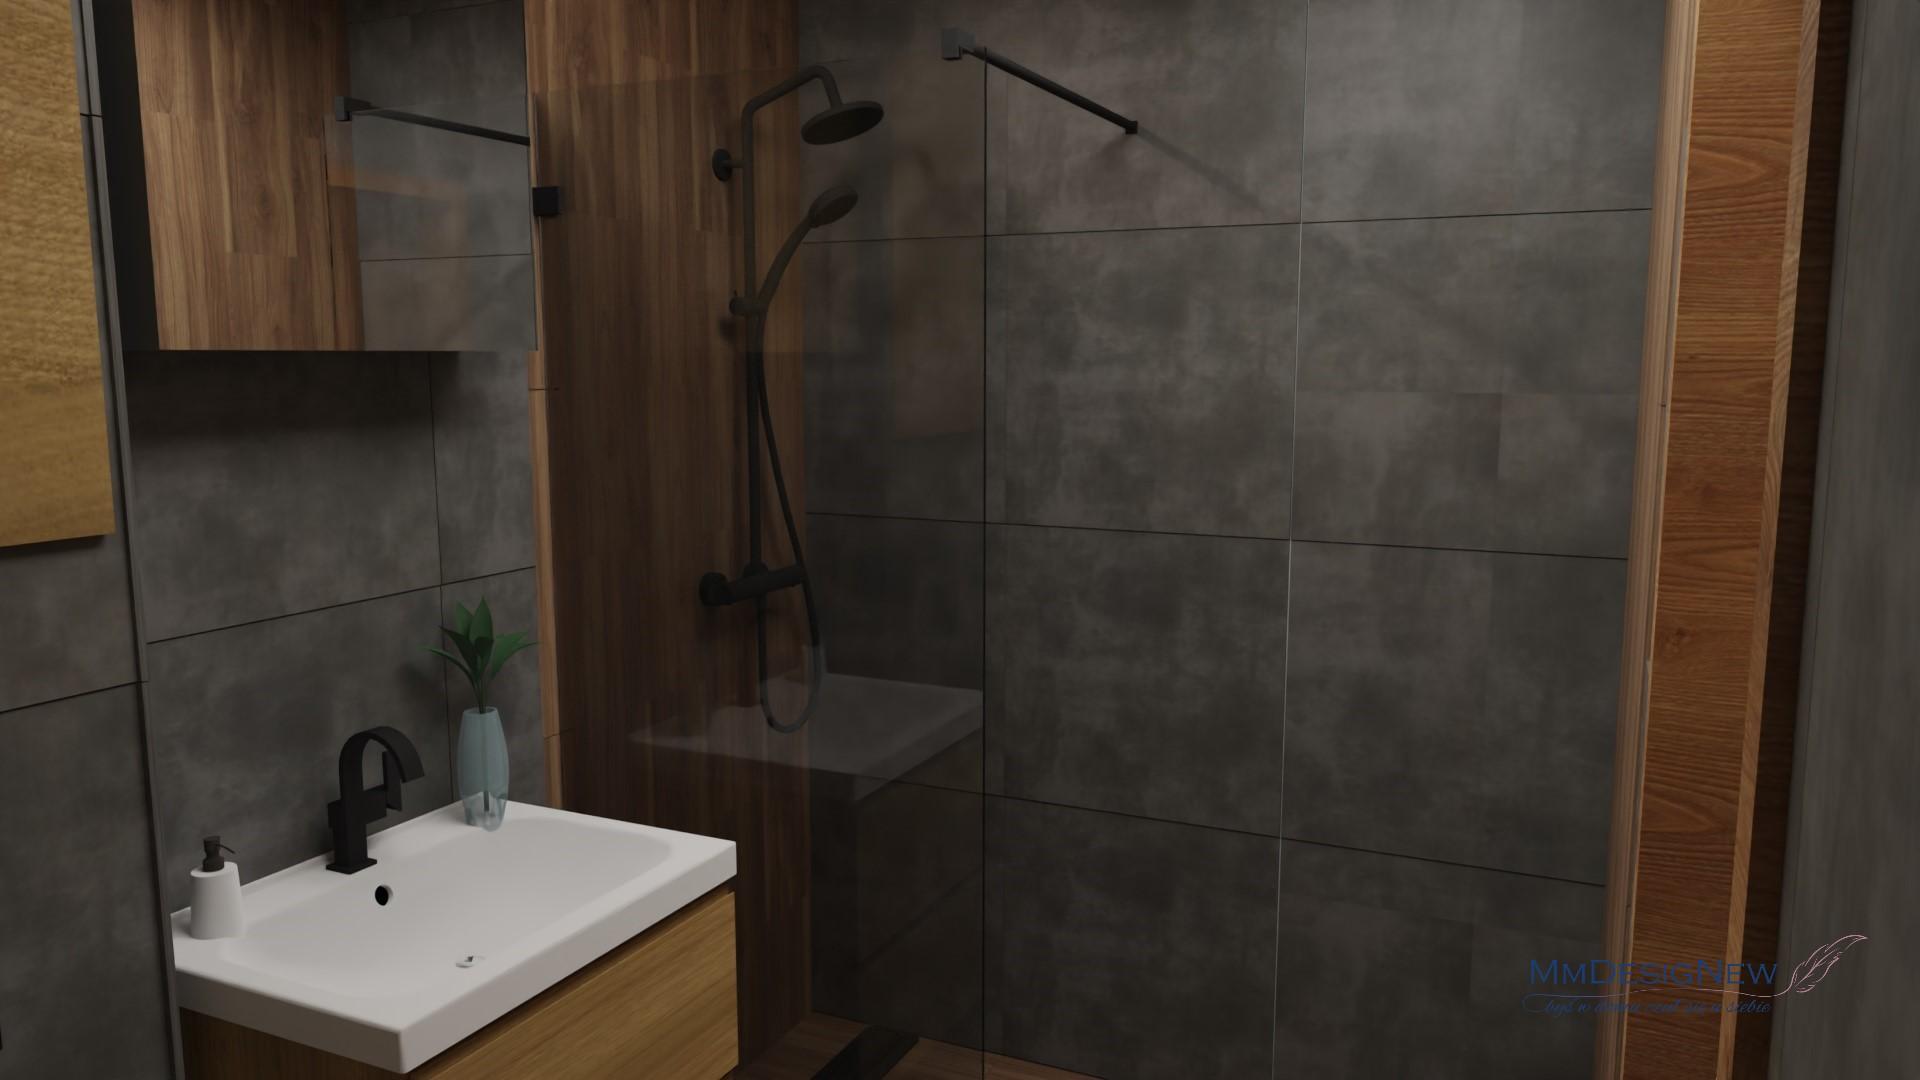 Beton pod prysznicem